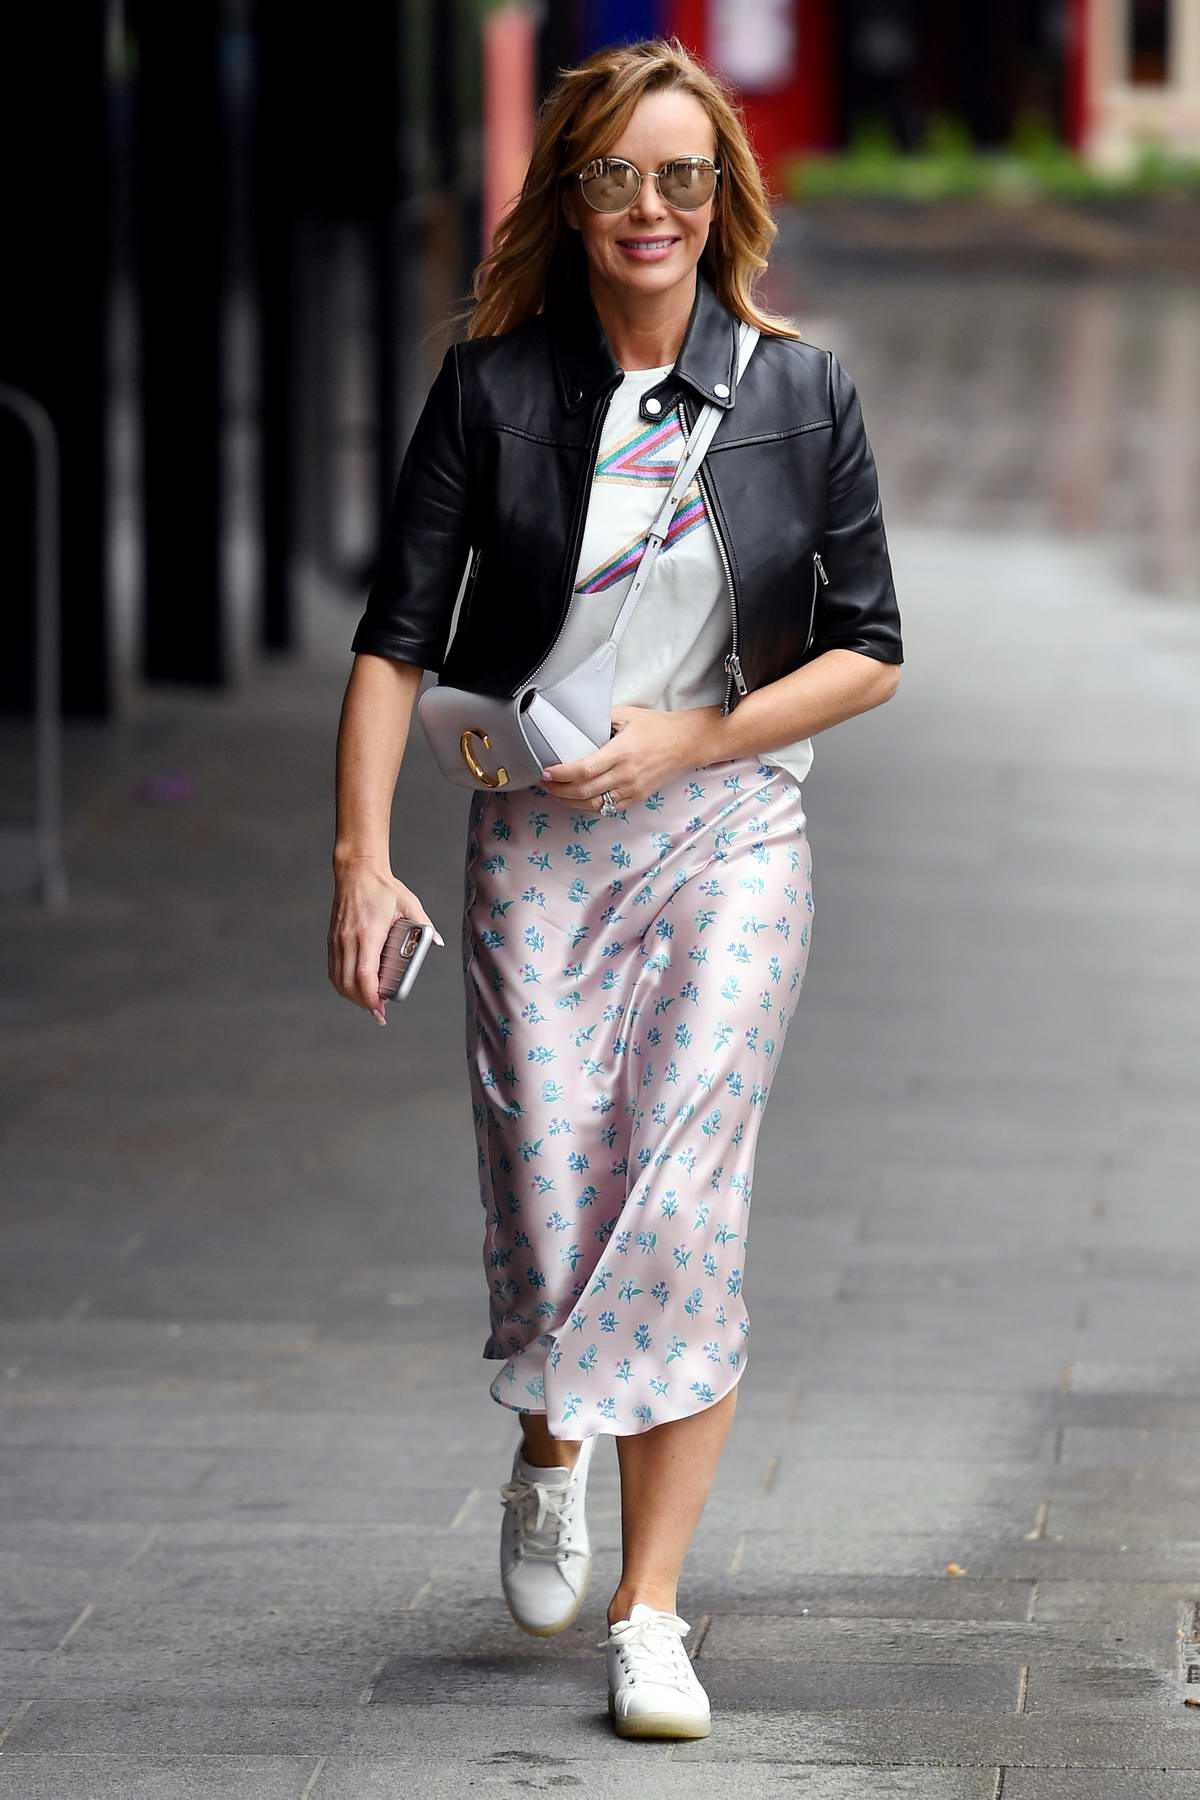 Amanda Holden seen wearing a black leather jacket as she leaves Global Studios in London, UK